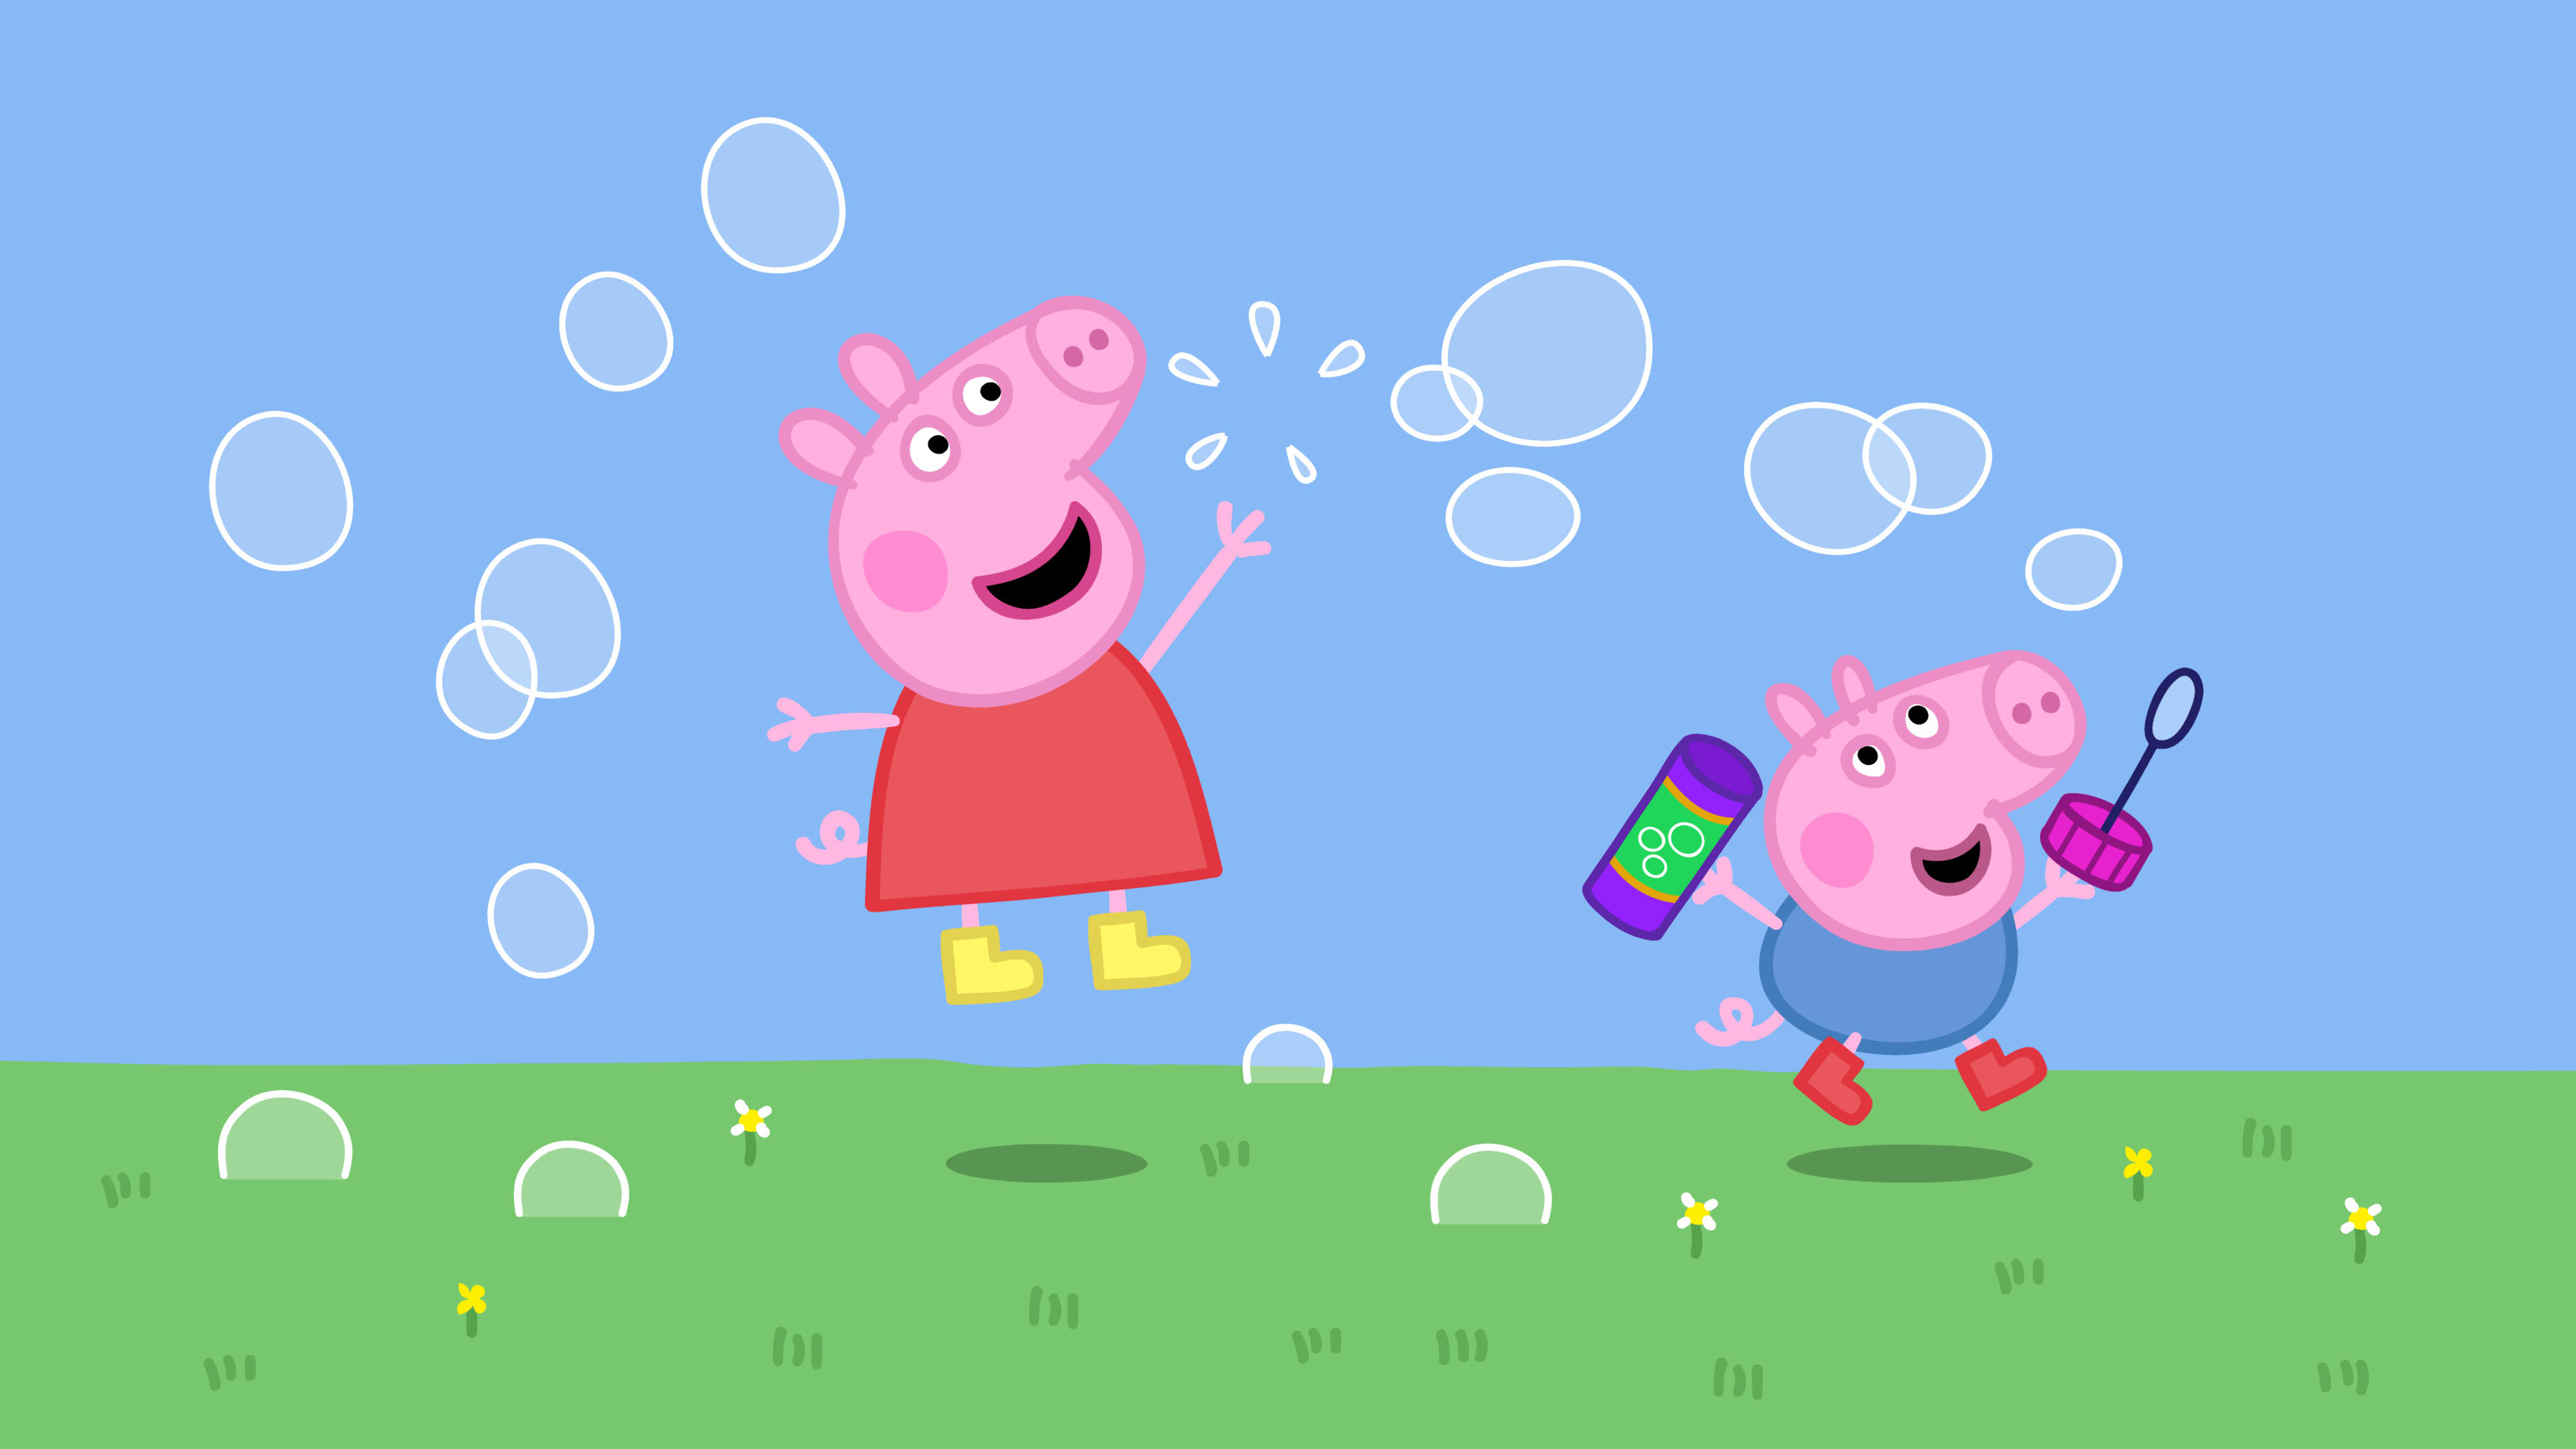 Peppa Pig comes to Canada via new Corus deal Kidscreen 3072x1728